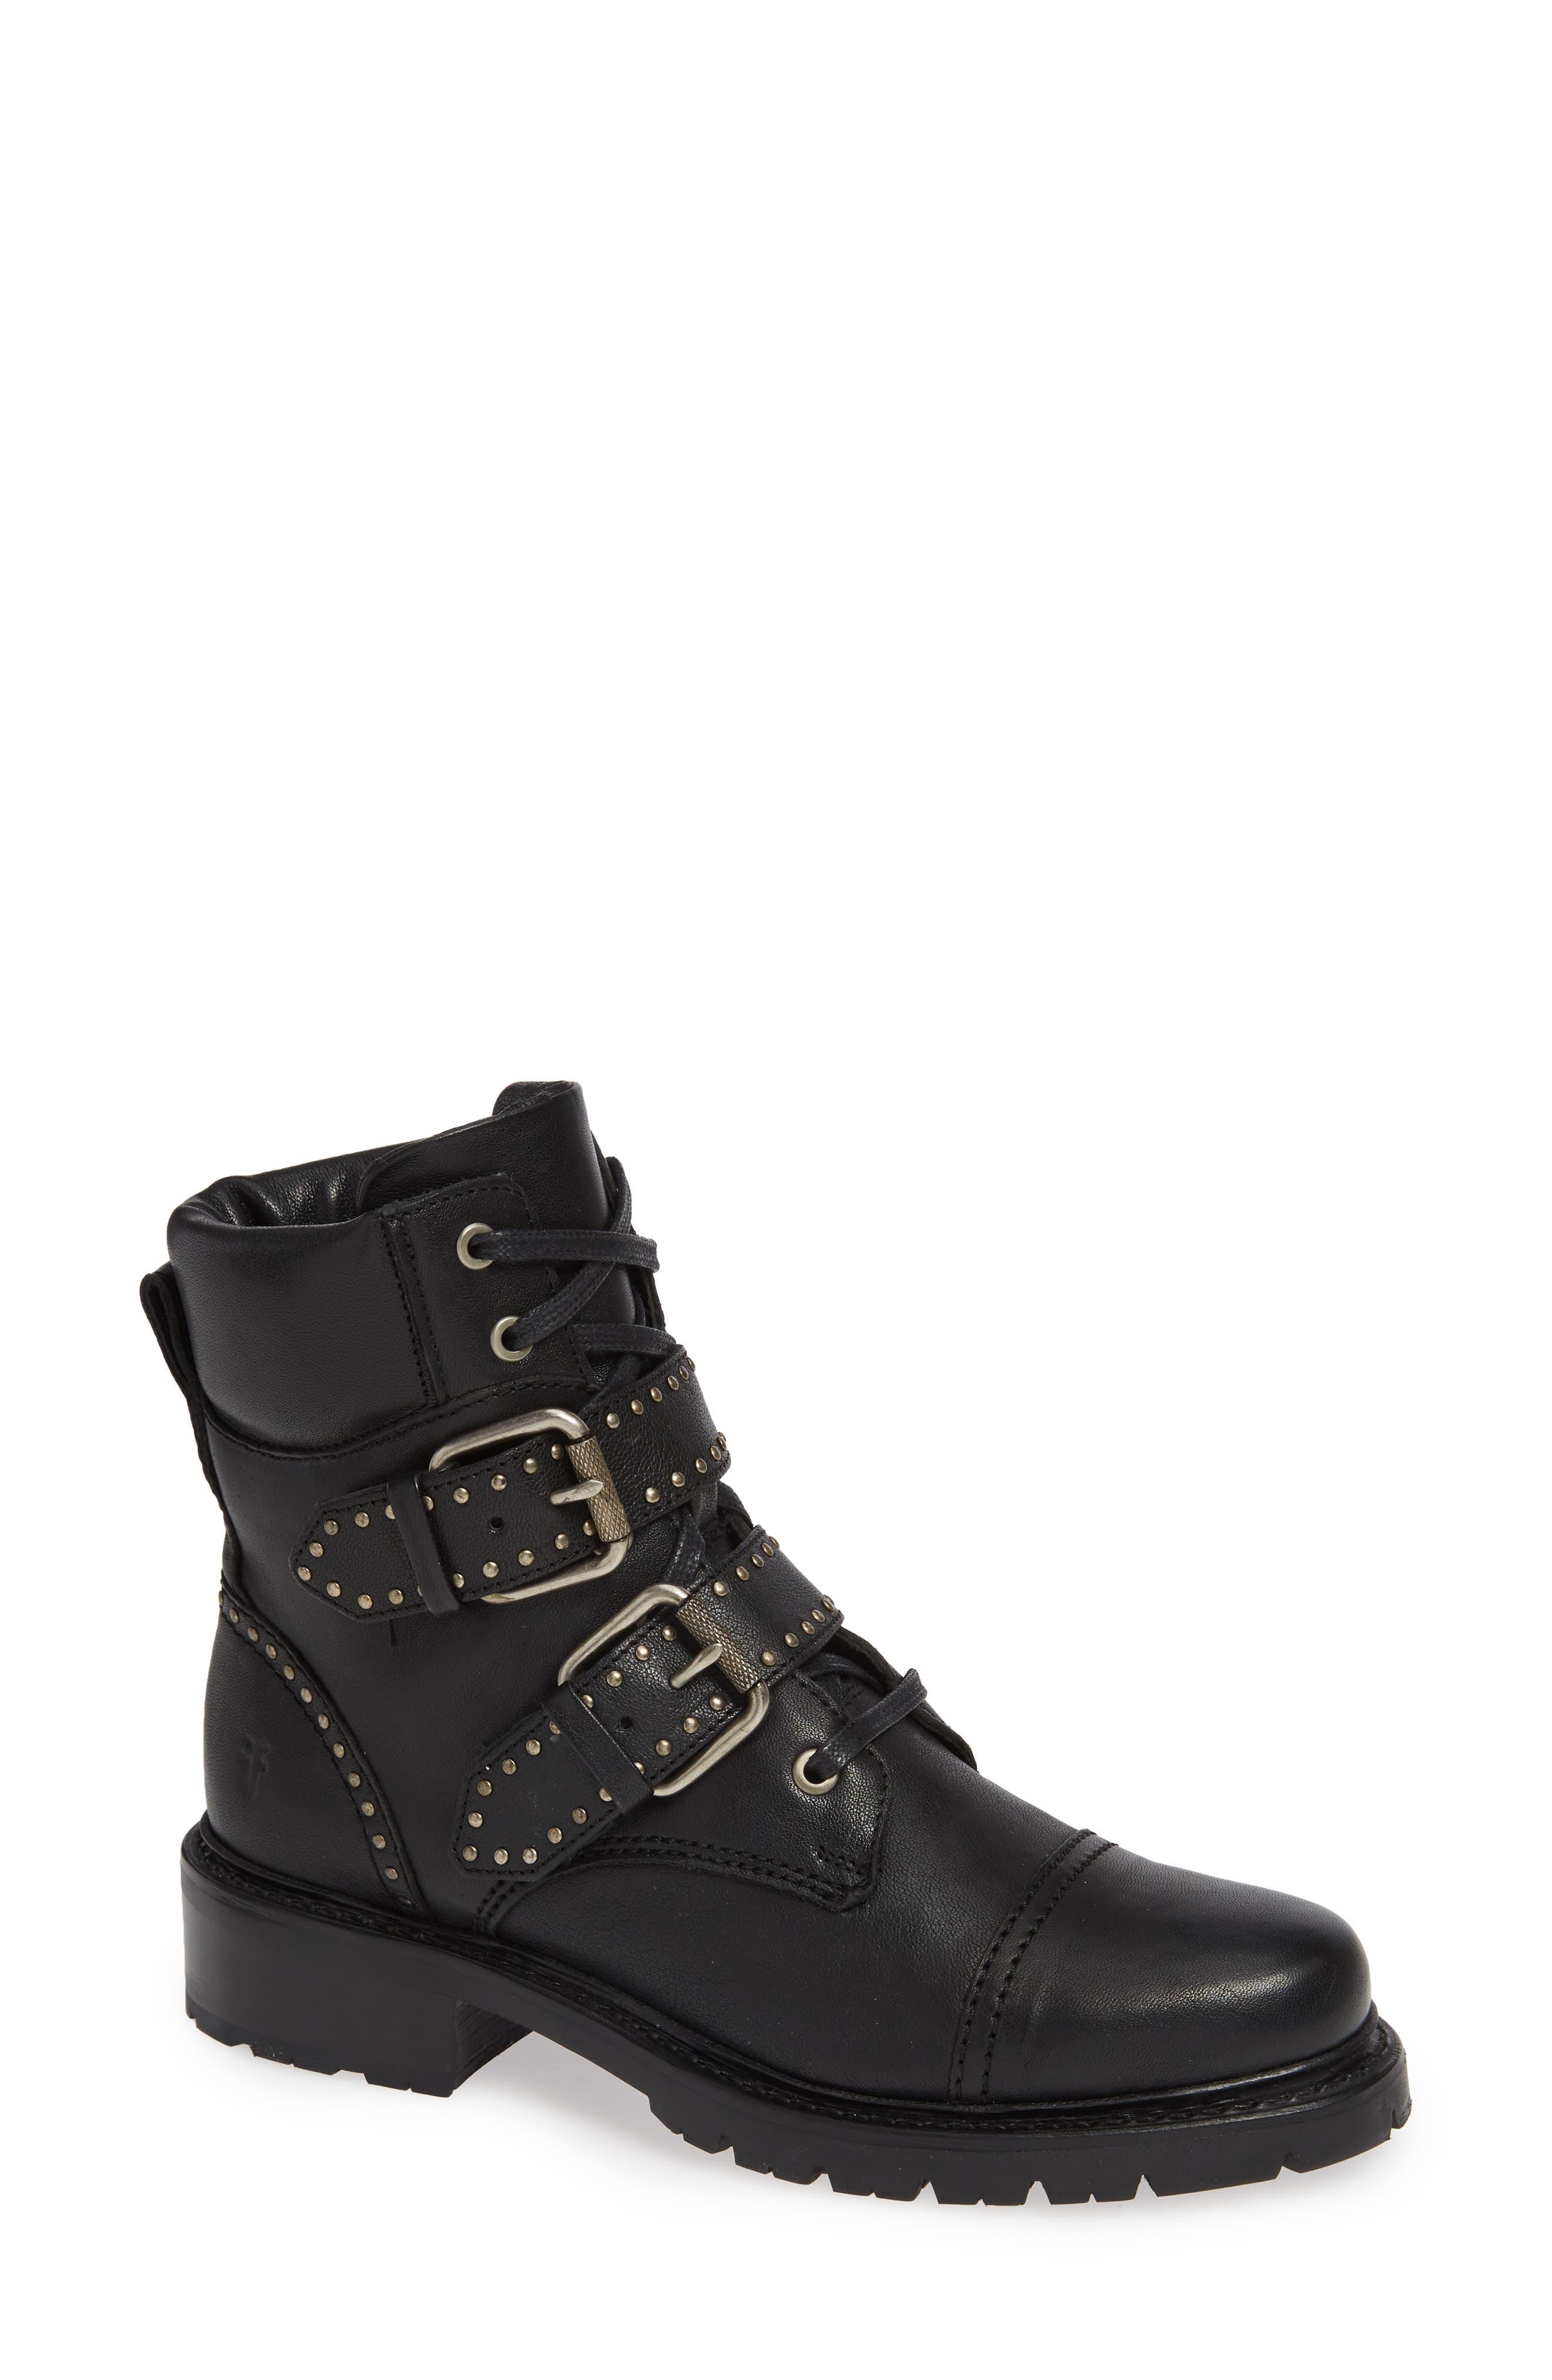 FRYE Samantha Stud Buckle Boots, Main, color, BLACK LEATHER